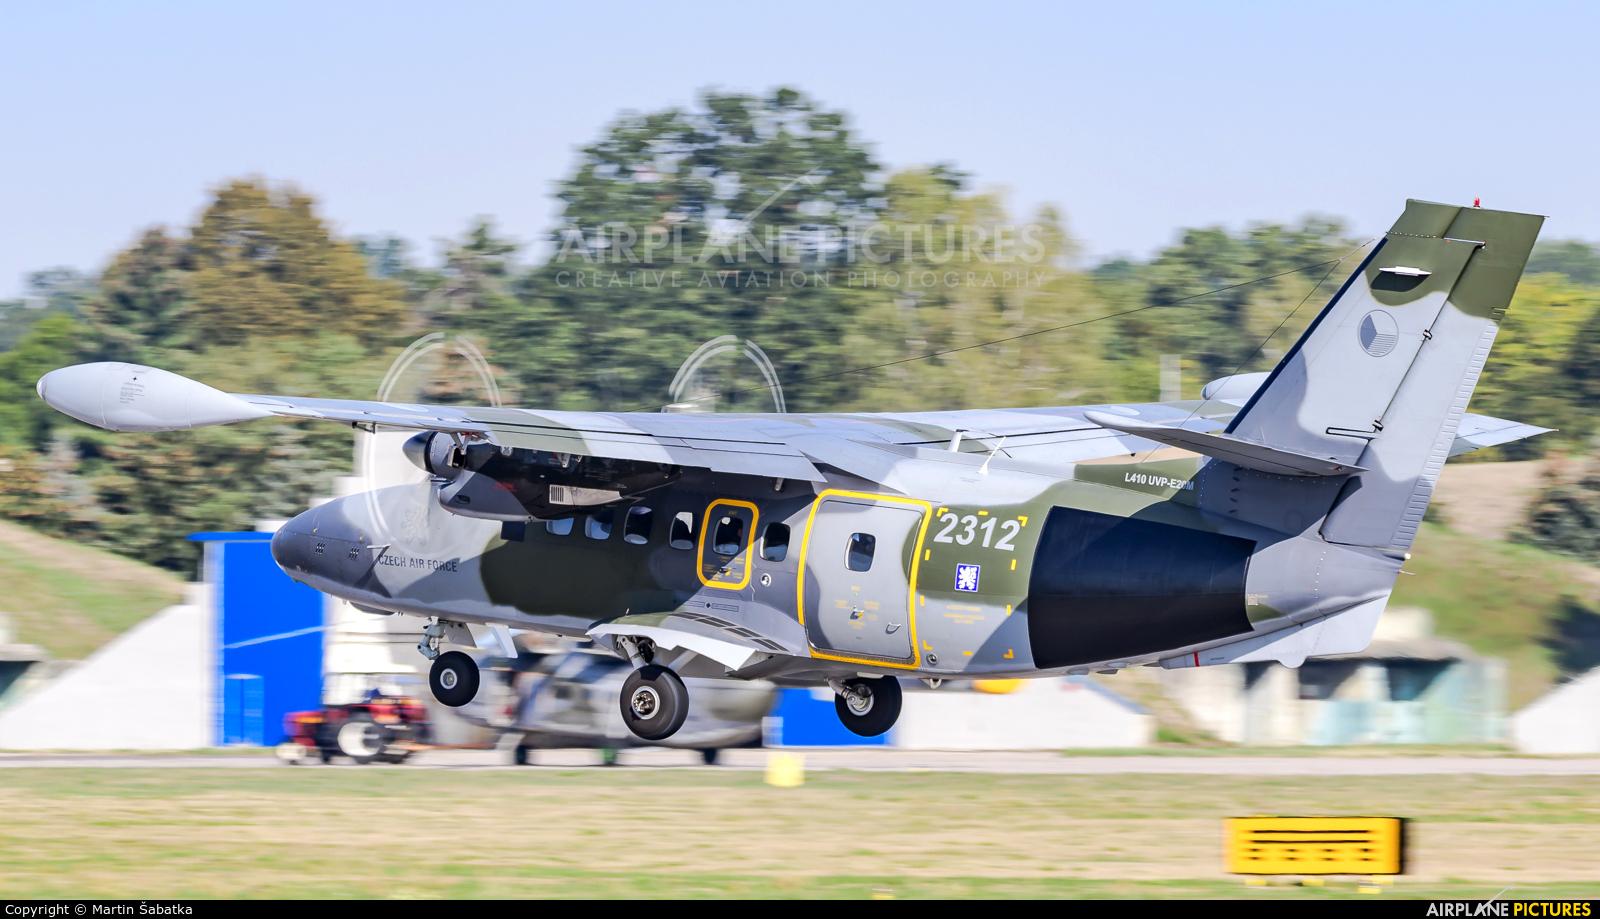 Czech - Air Force 2312 aircraft at Pardubice